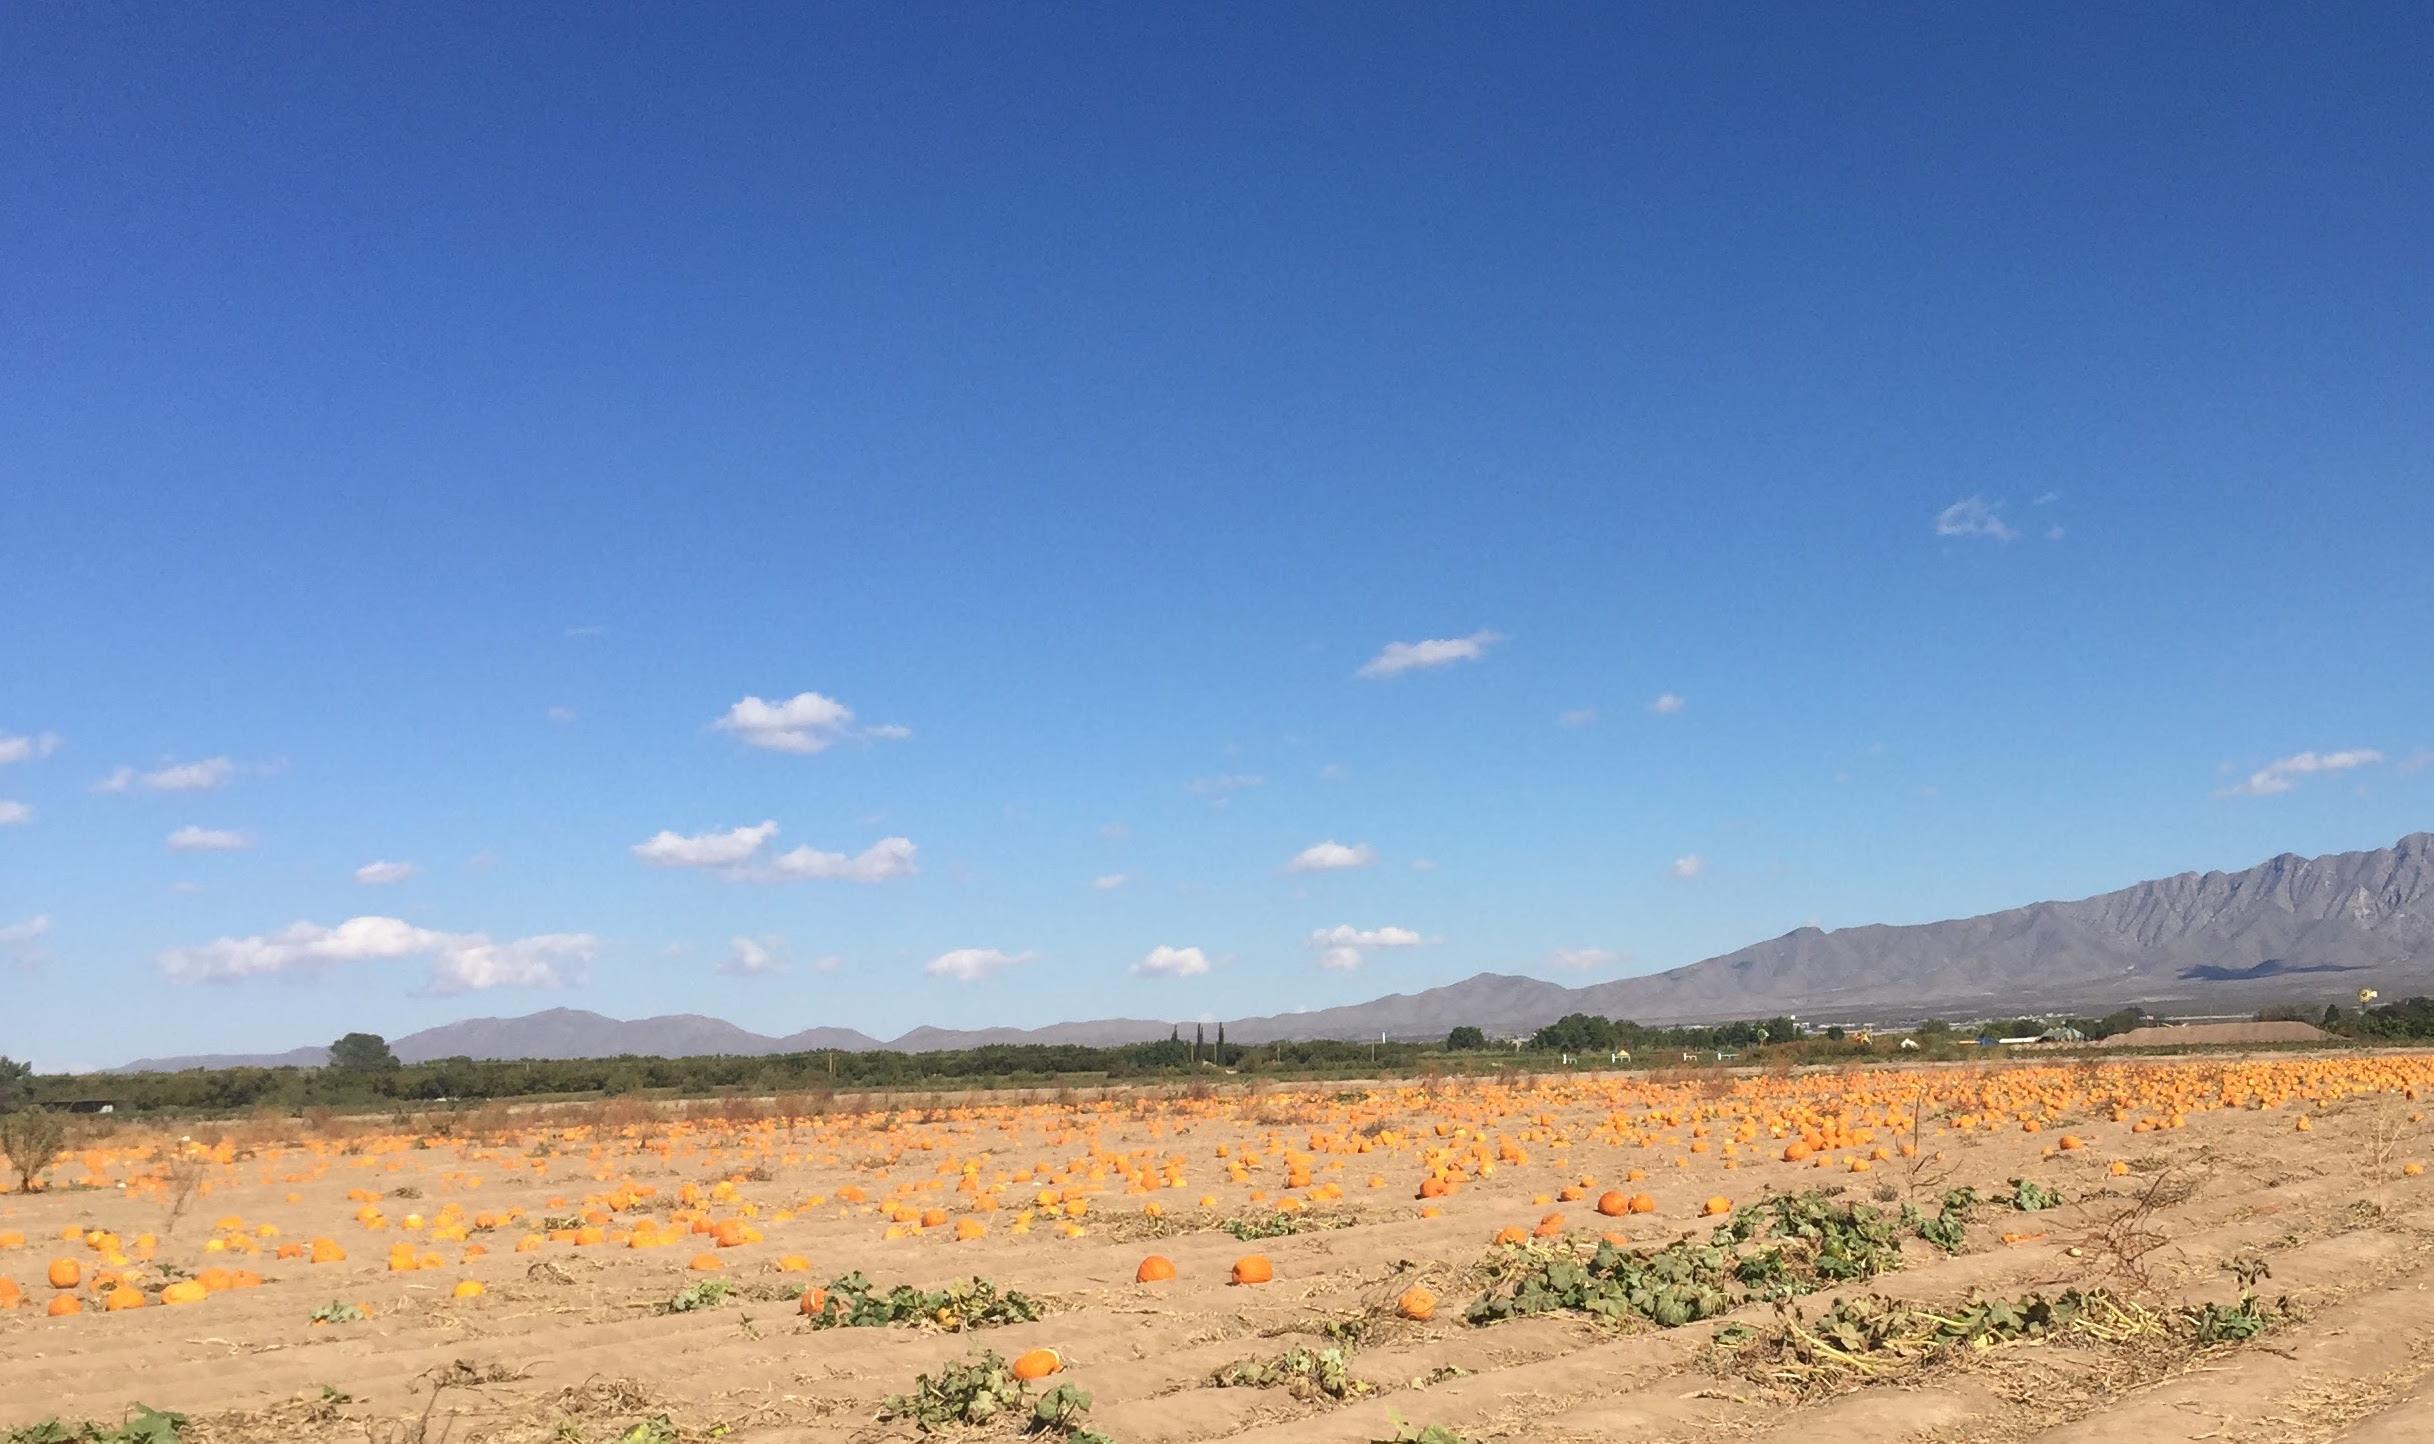 Pumpkin field!